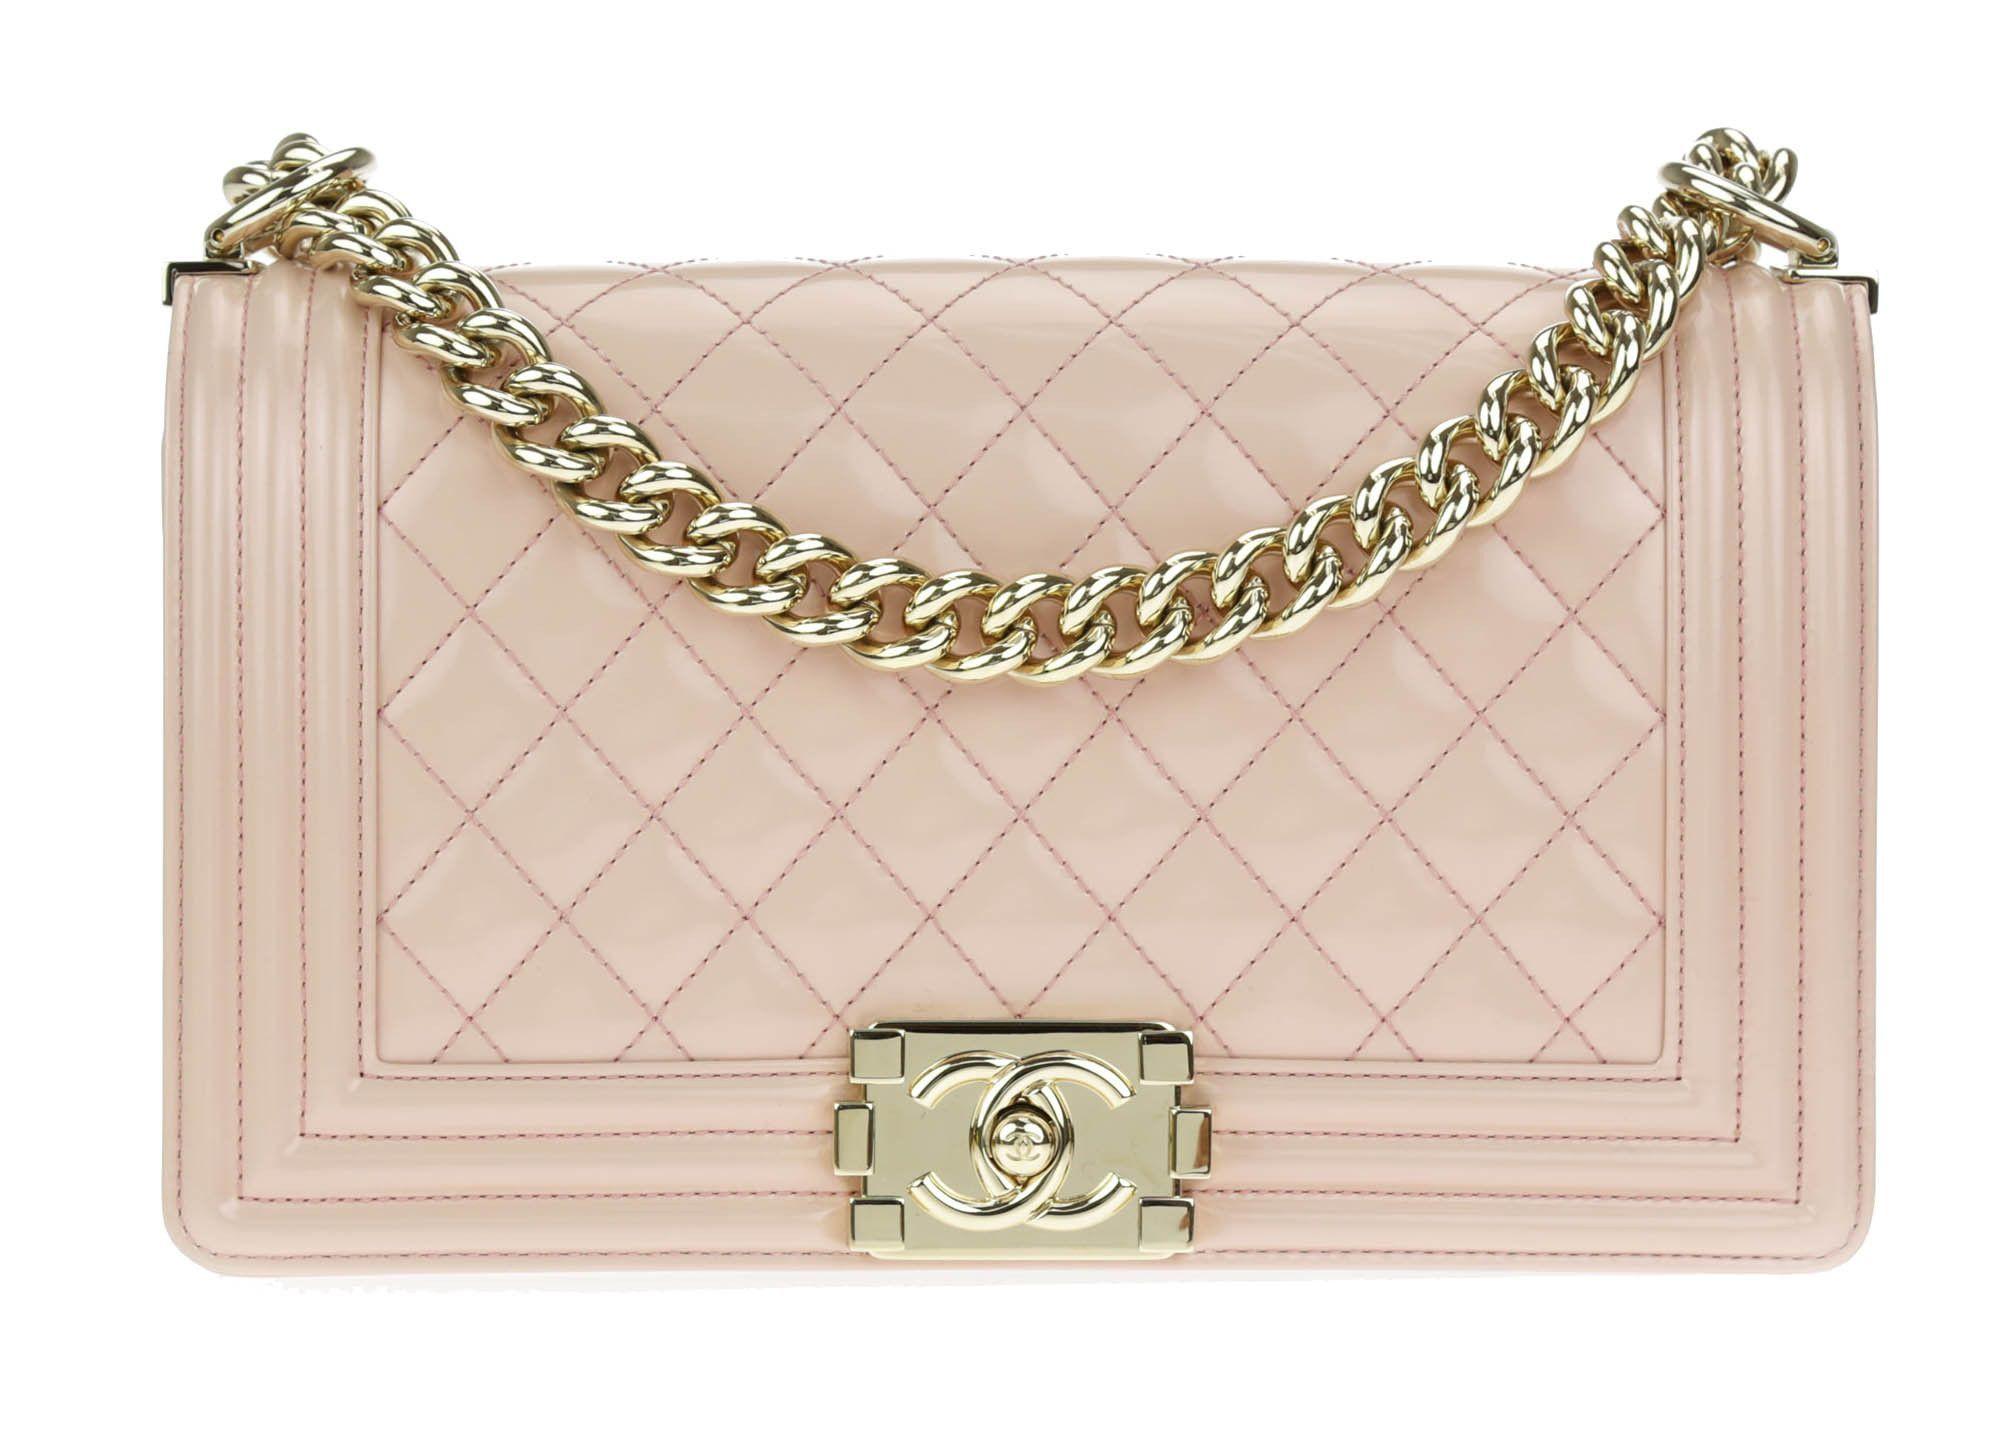 Chanel Light Pink Patent Leather Medium Boy Bag | Patent leather ...